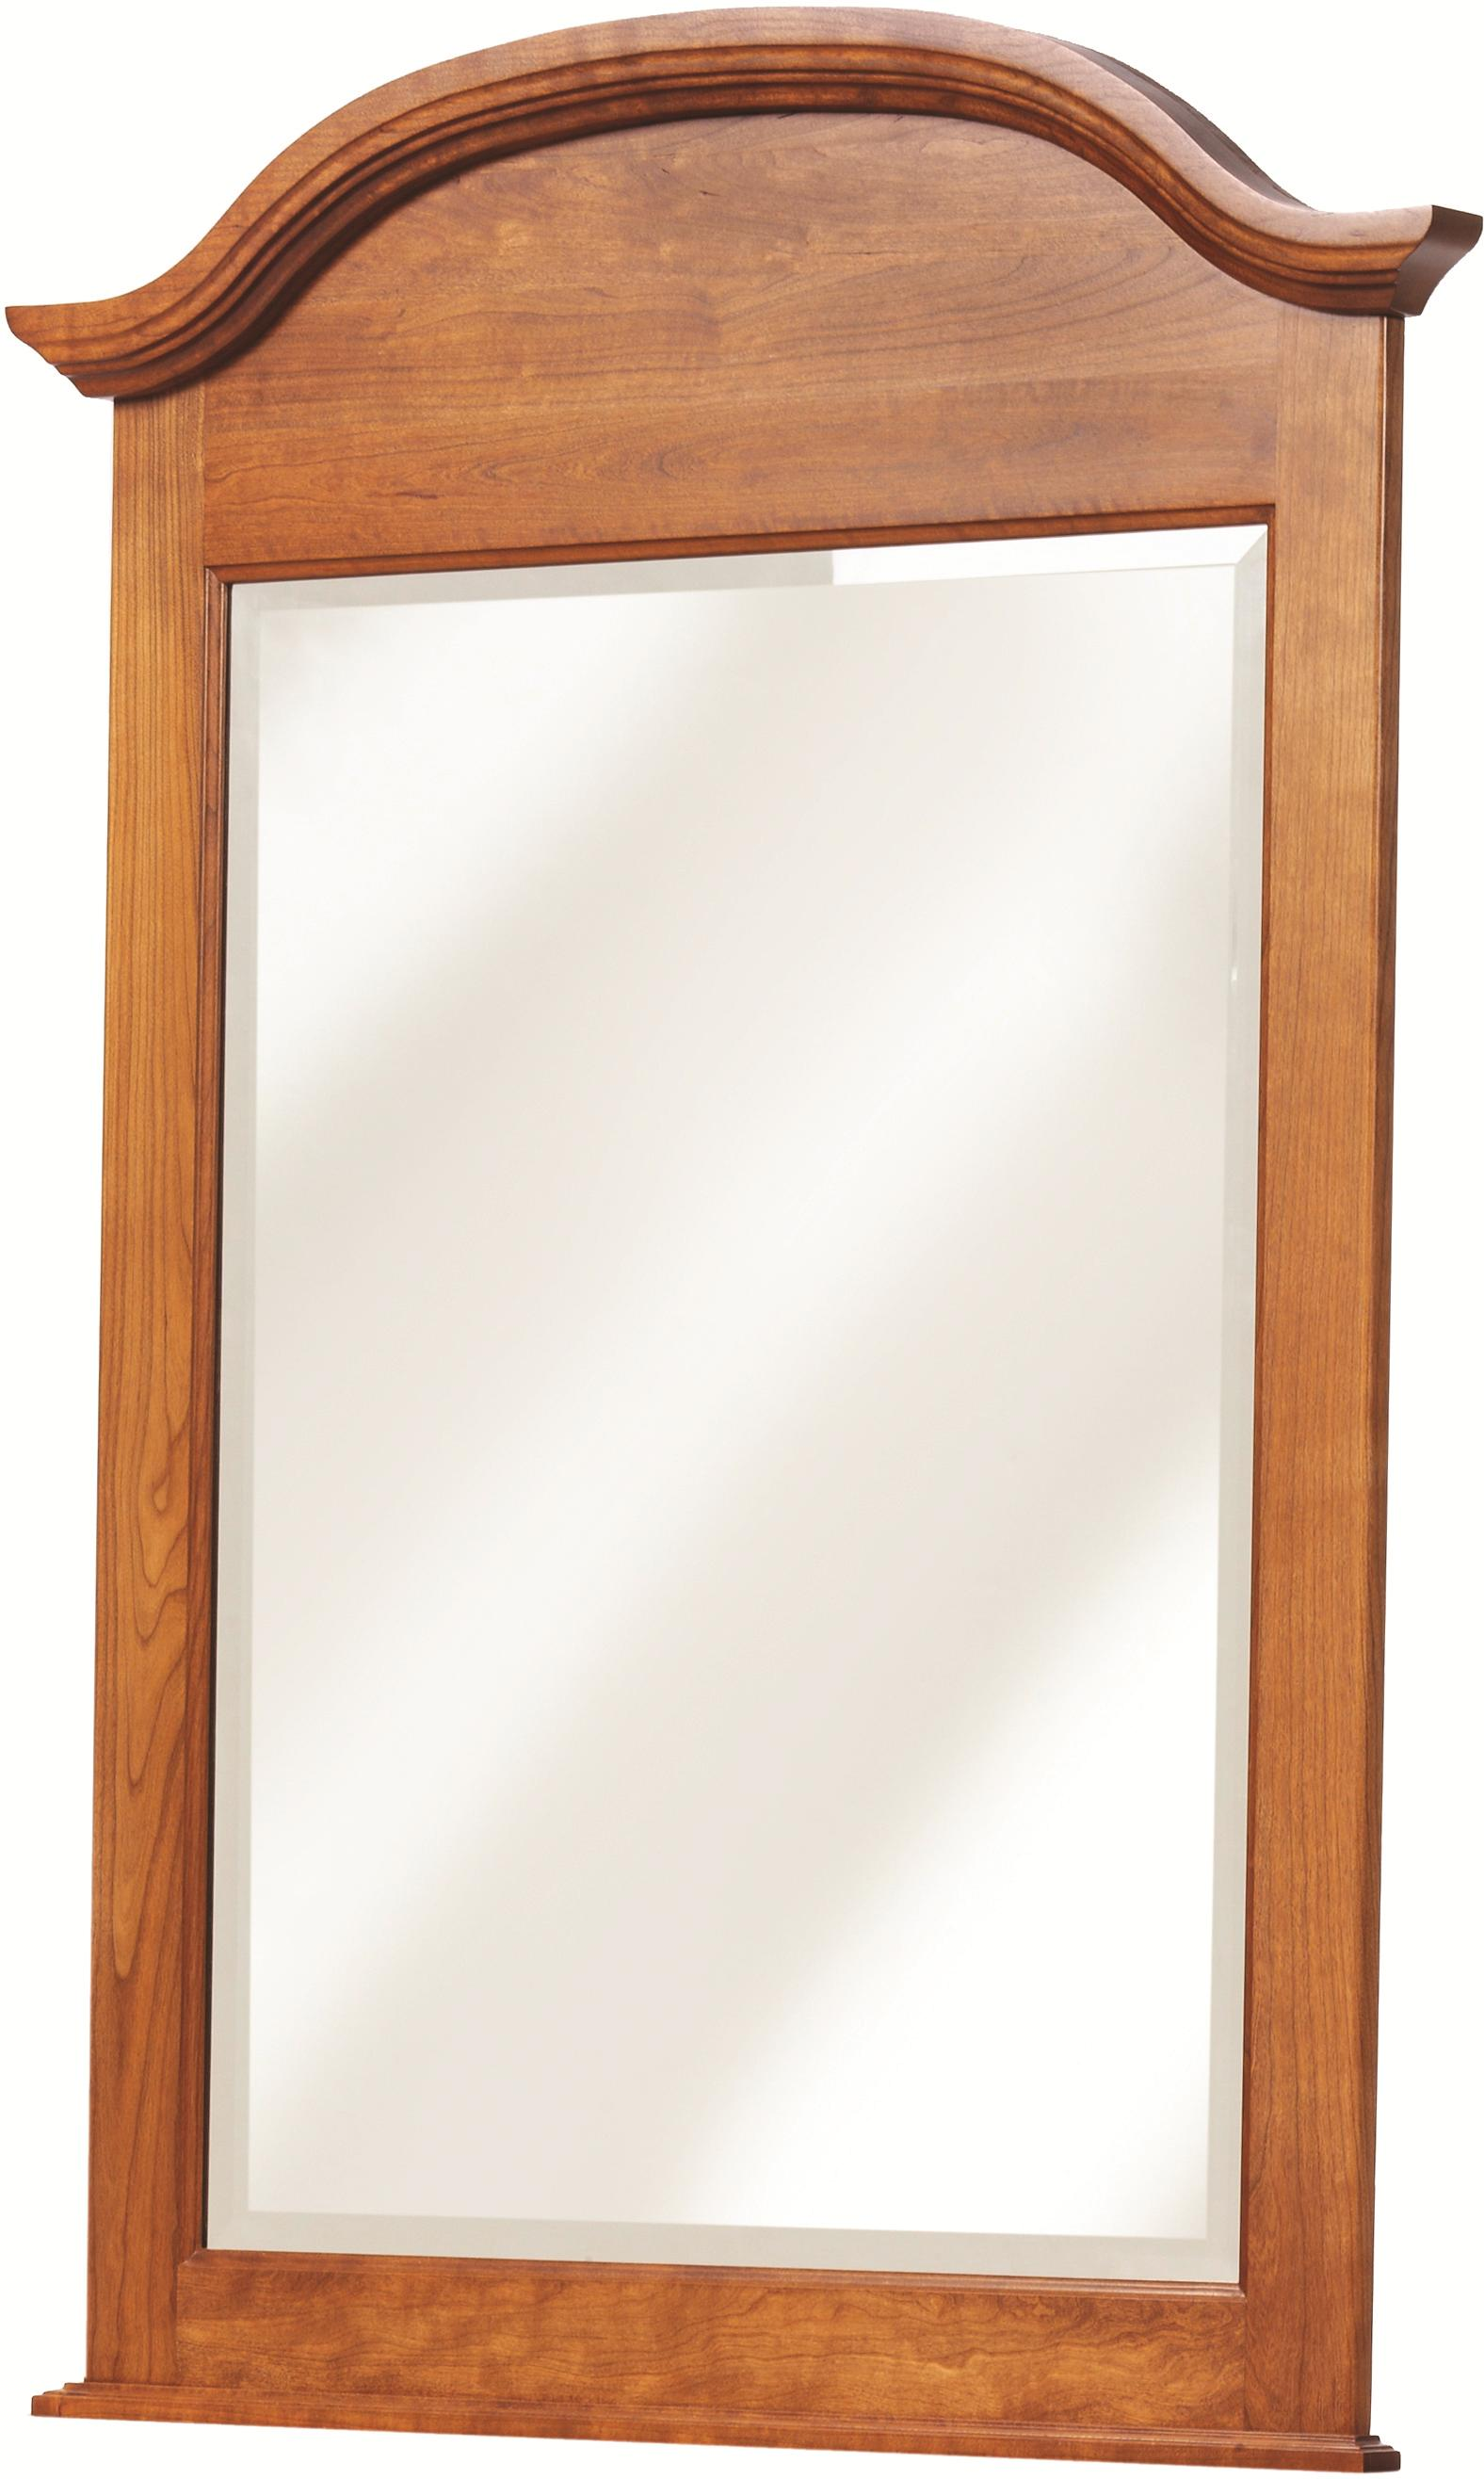 Victorias Tradition Dresser Mirror by Millcraft at Virginia Furniture Market